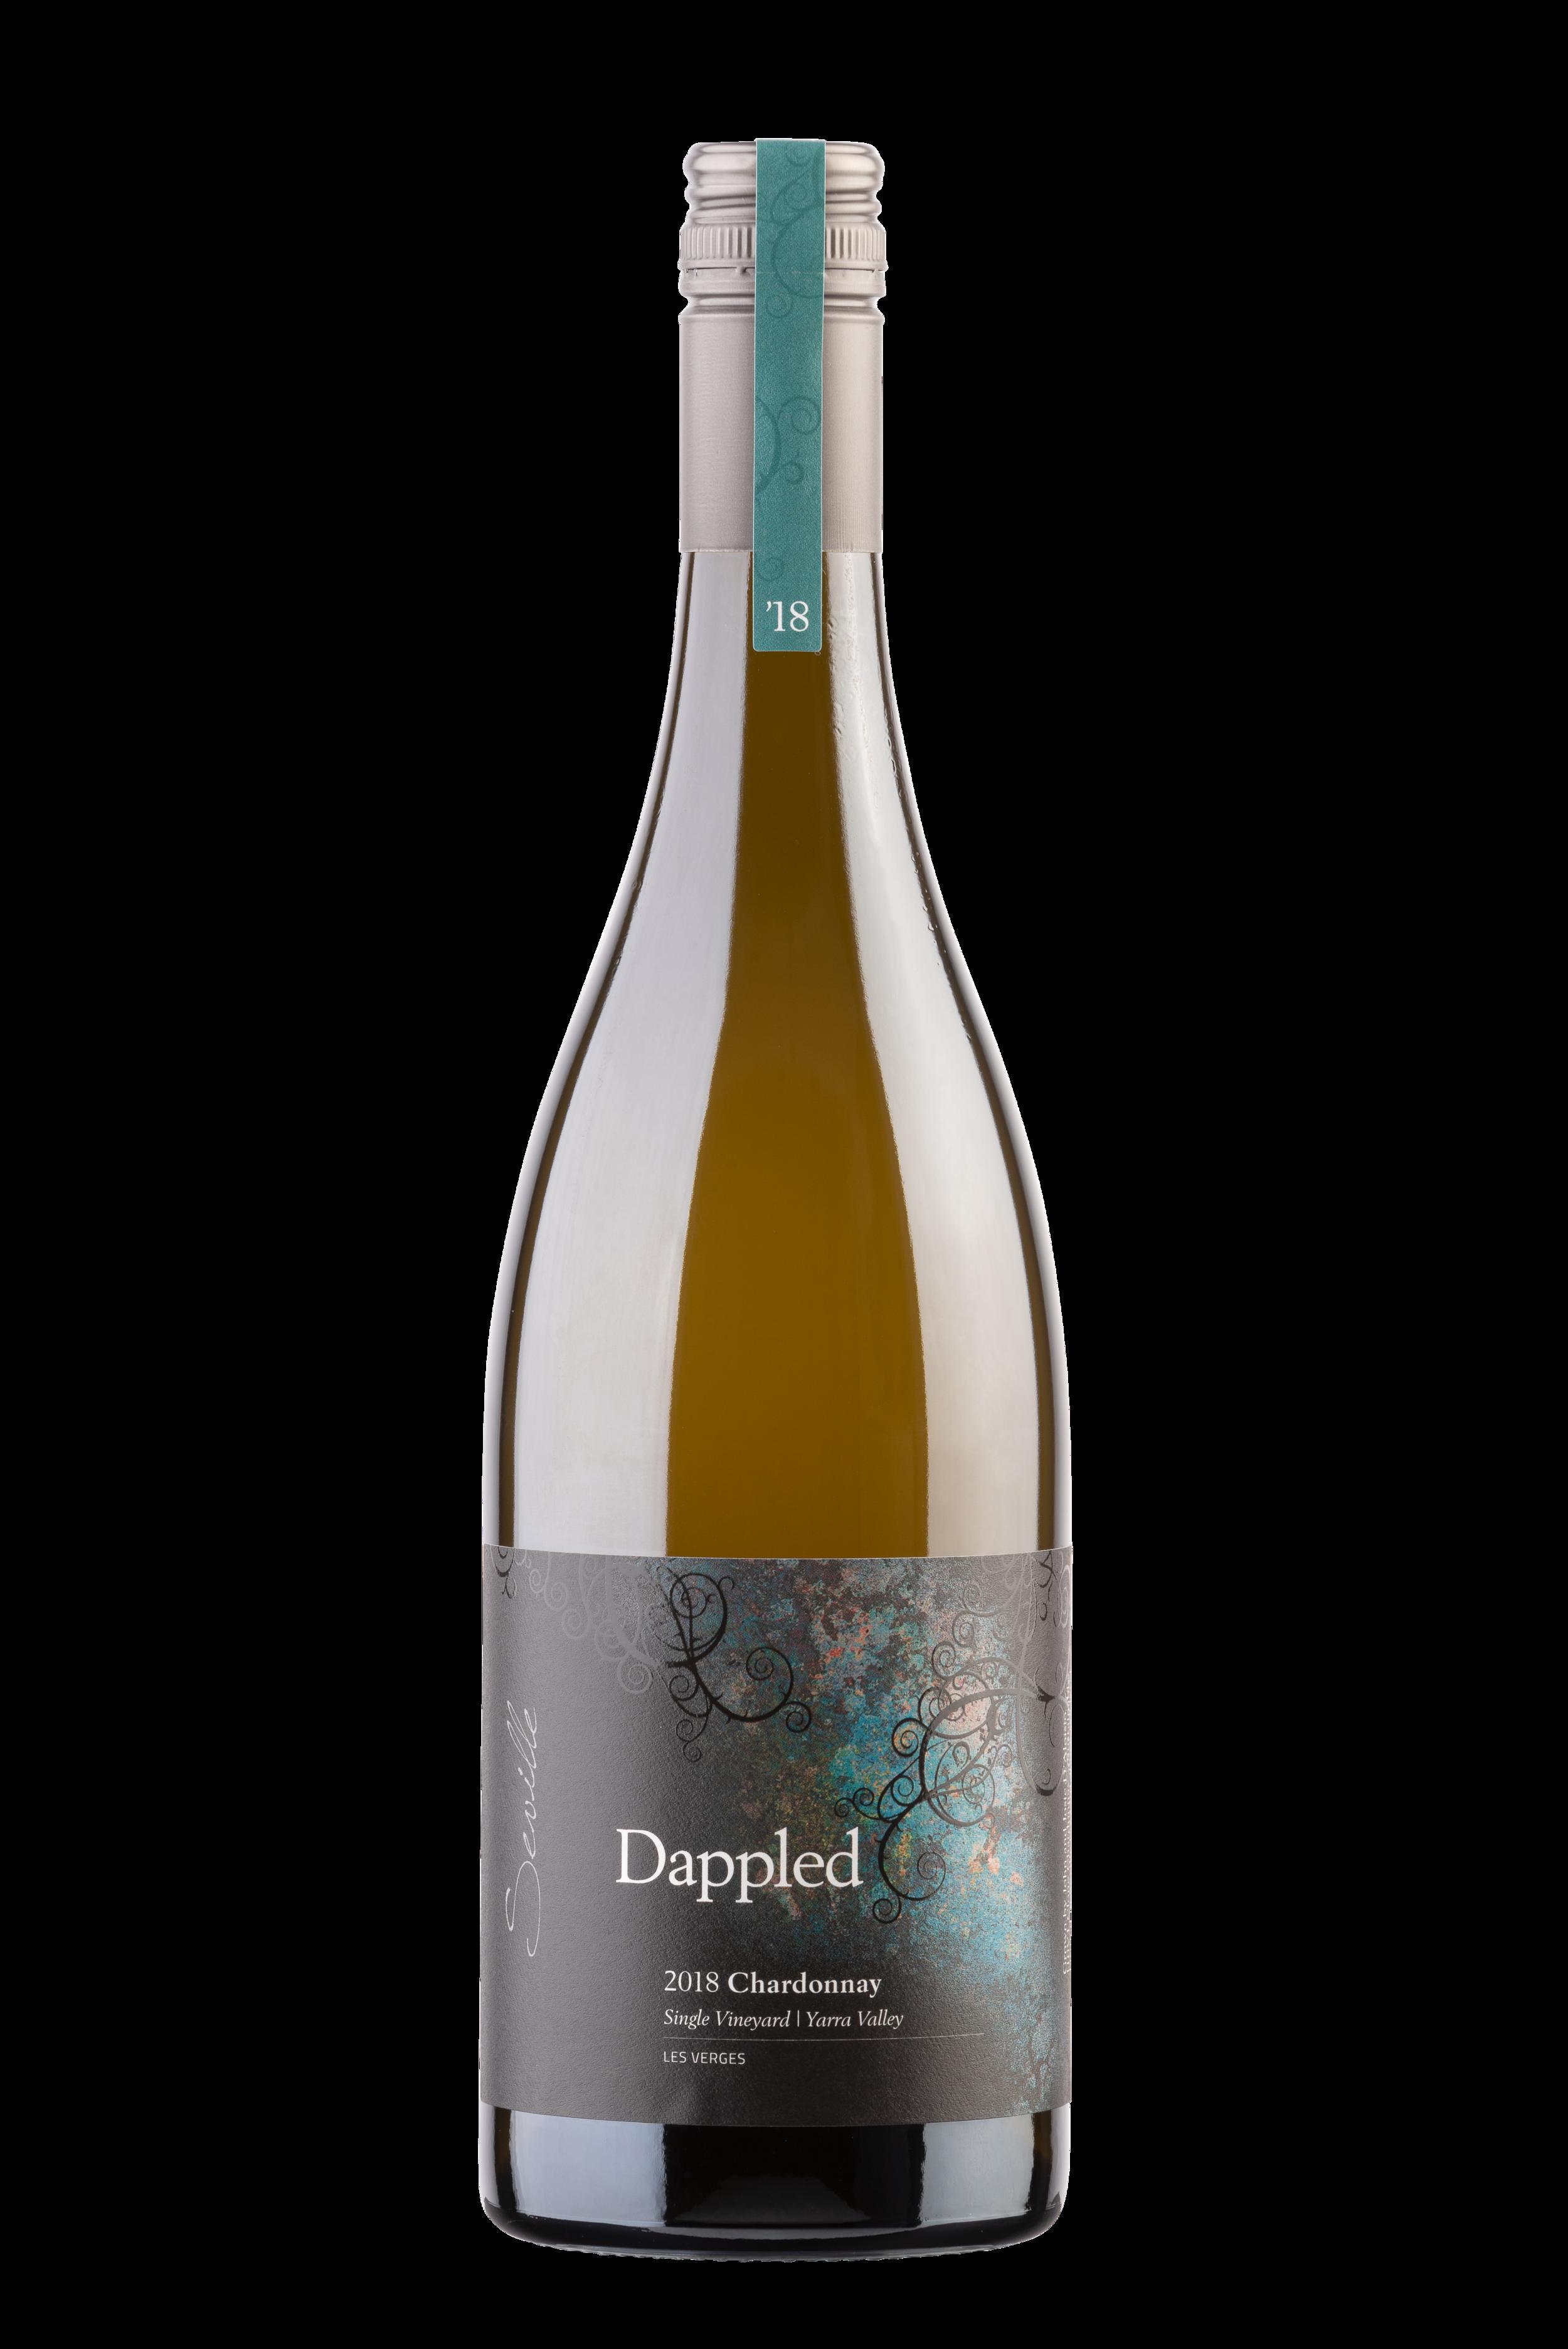 2018 Chardonnay_Dappled_23July2019-028.png